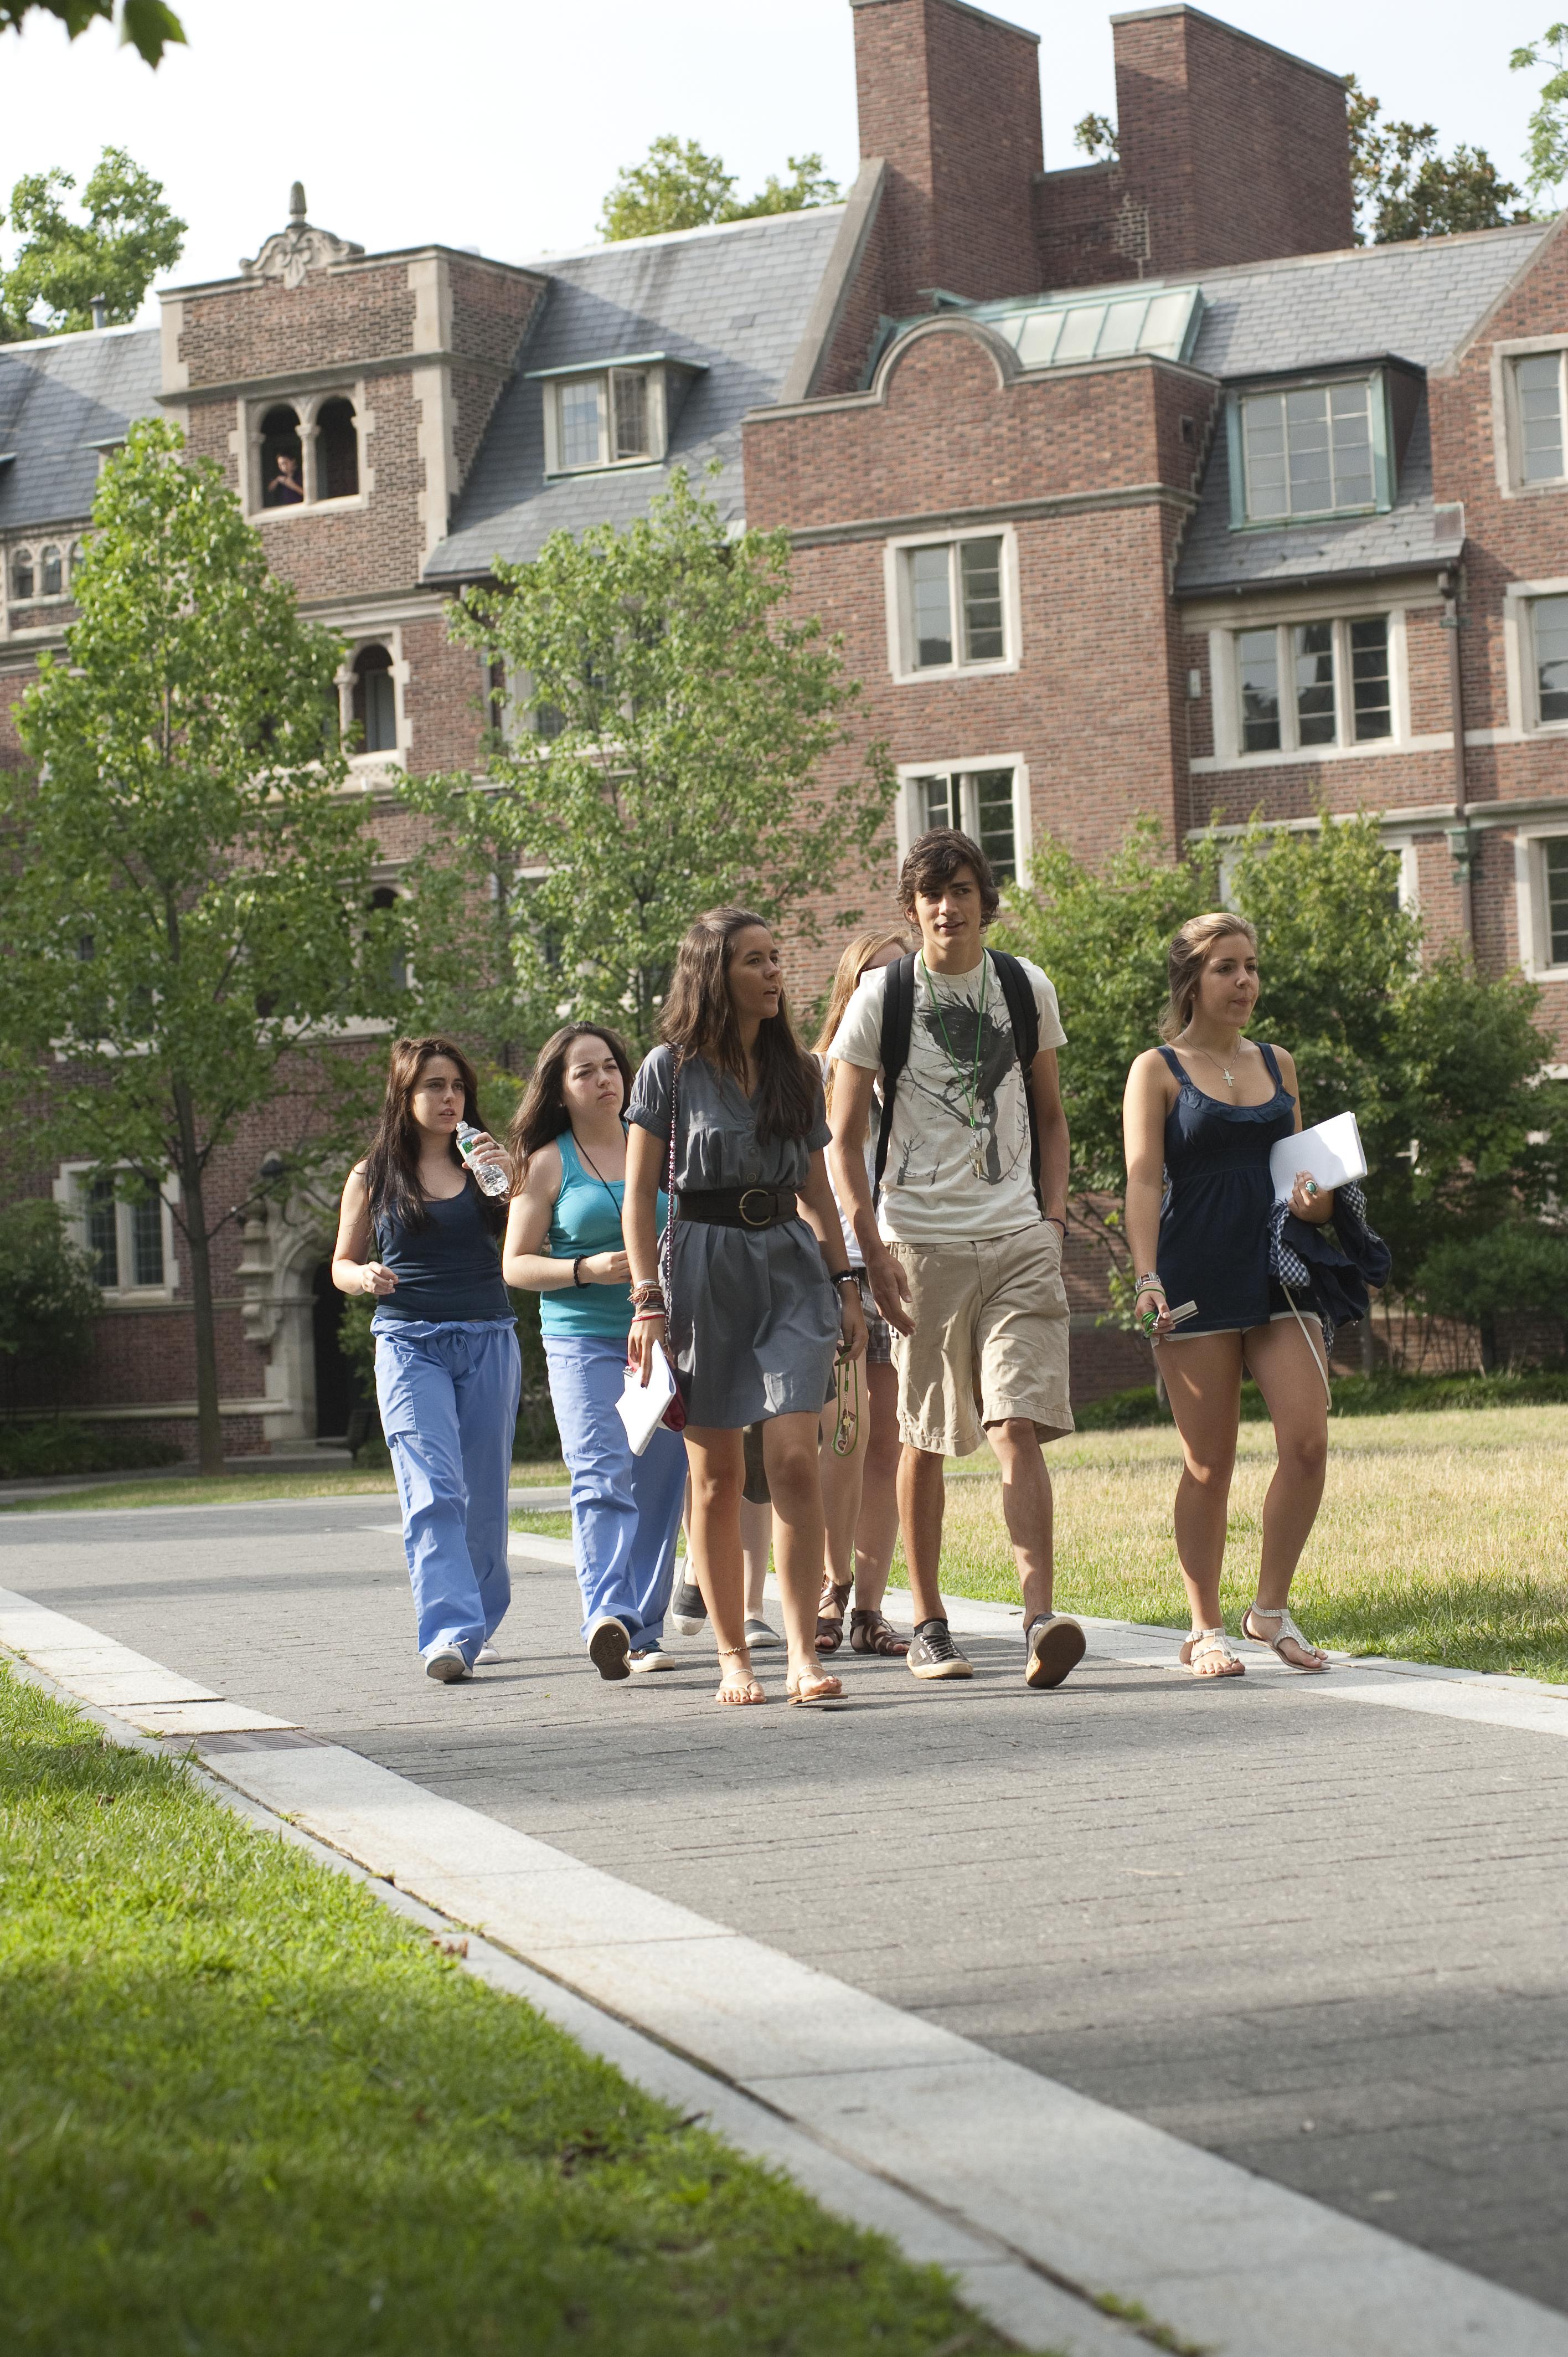 Summer Program - Pre-College | Julian Krinsky: Architecture - Summer at Penn